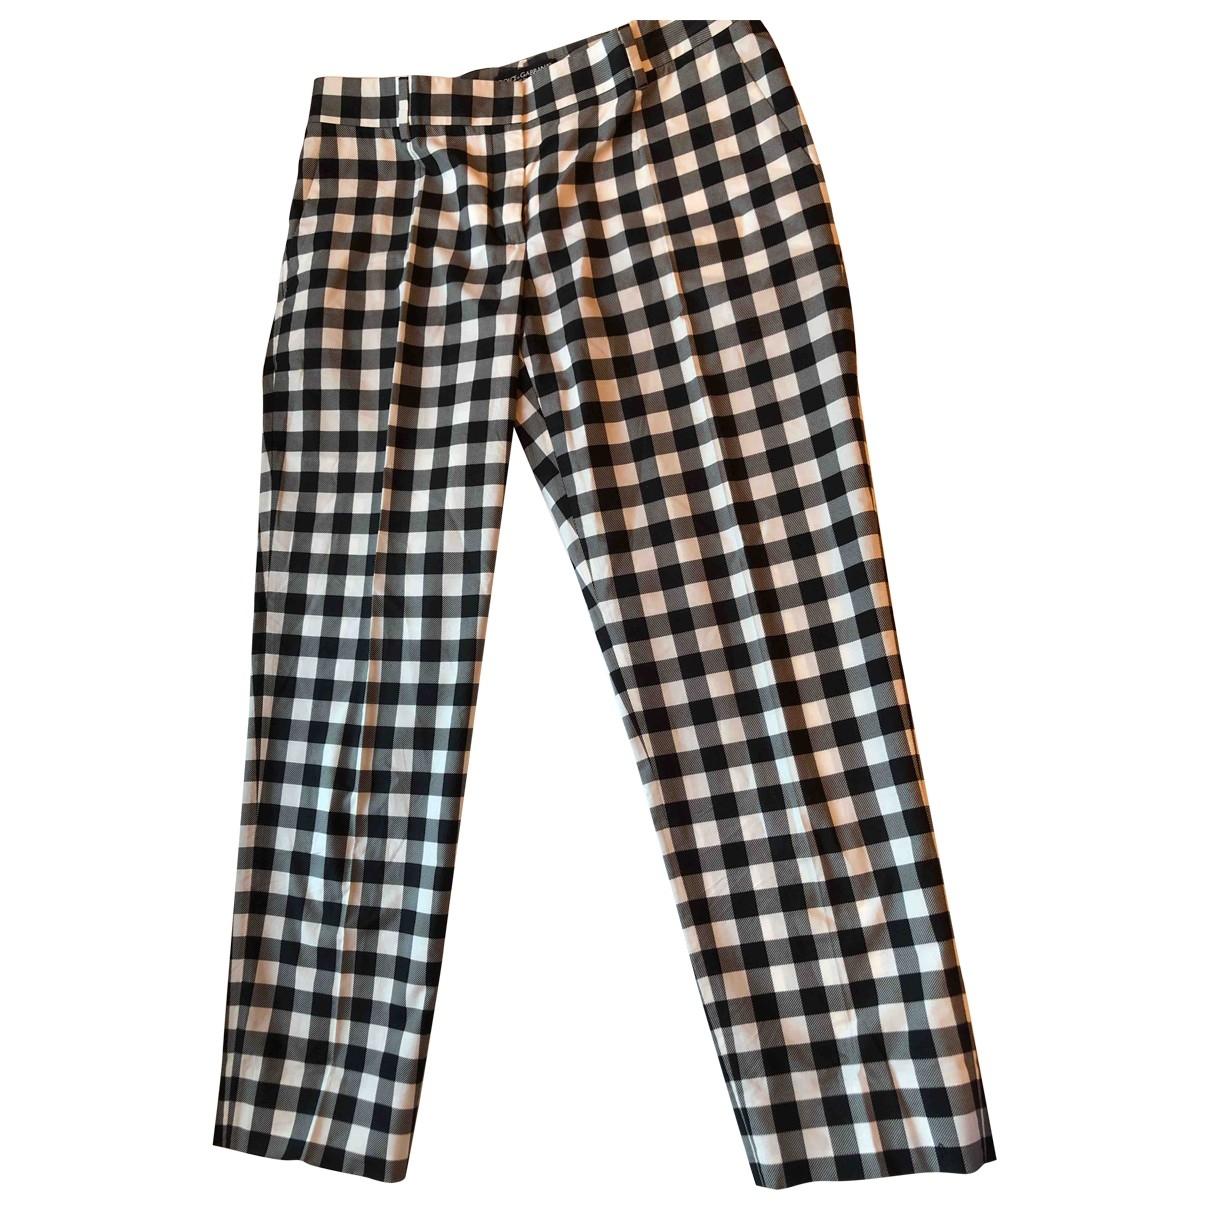 Dolce & Gabbana \N Black Cotton Trousers for Women 44 IT